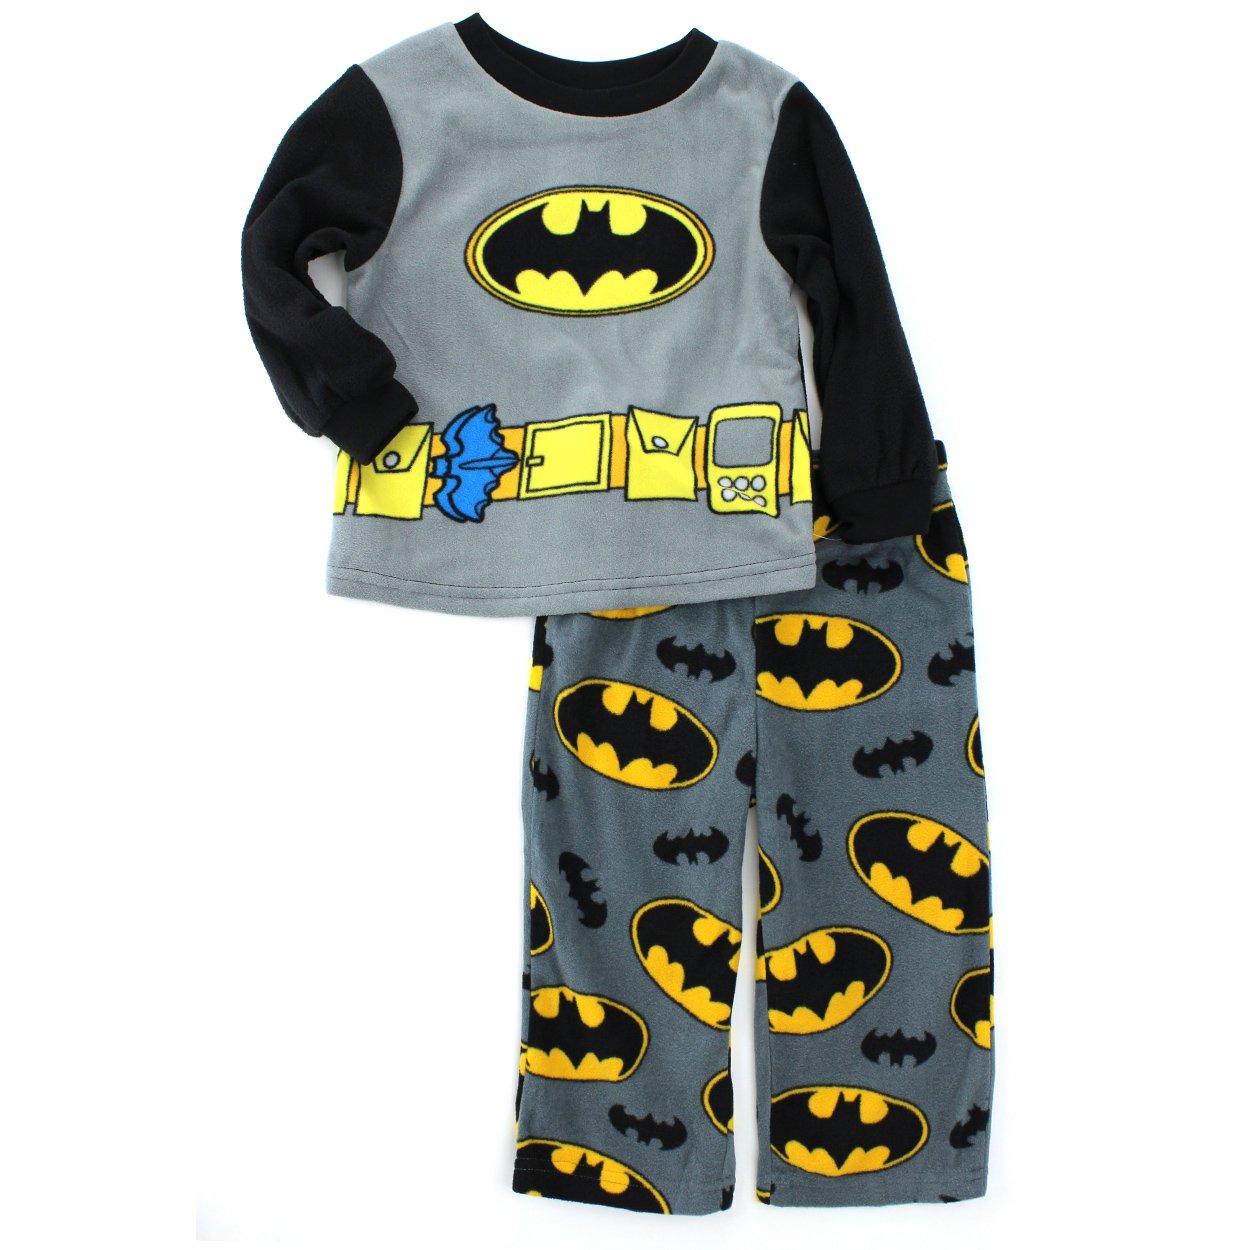 Batman Toddler Black Fleece Pajamas